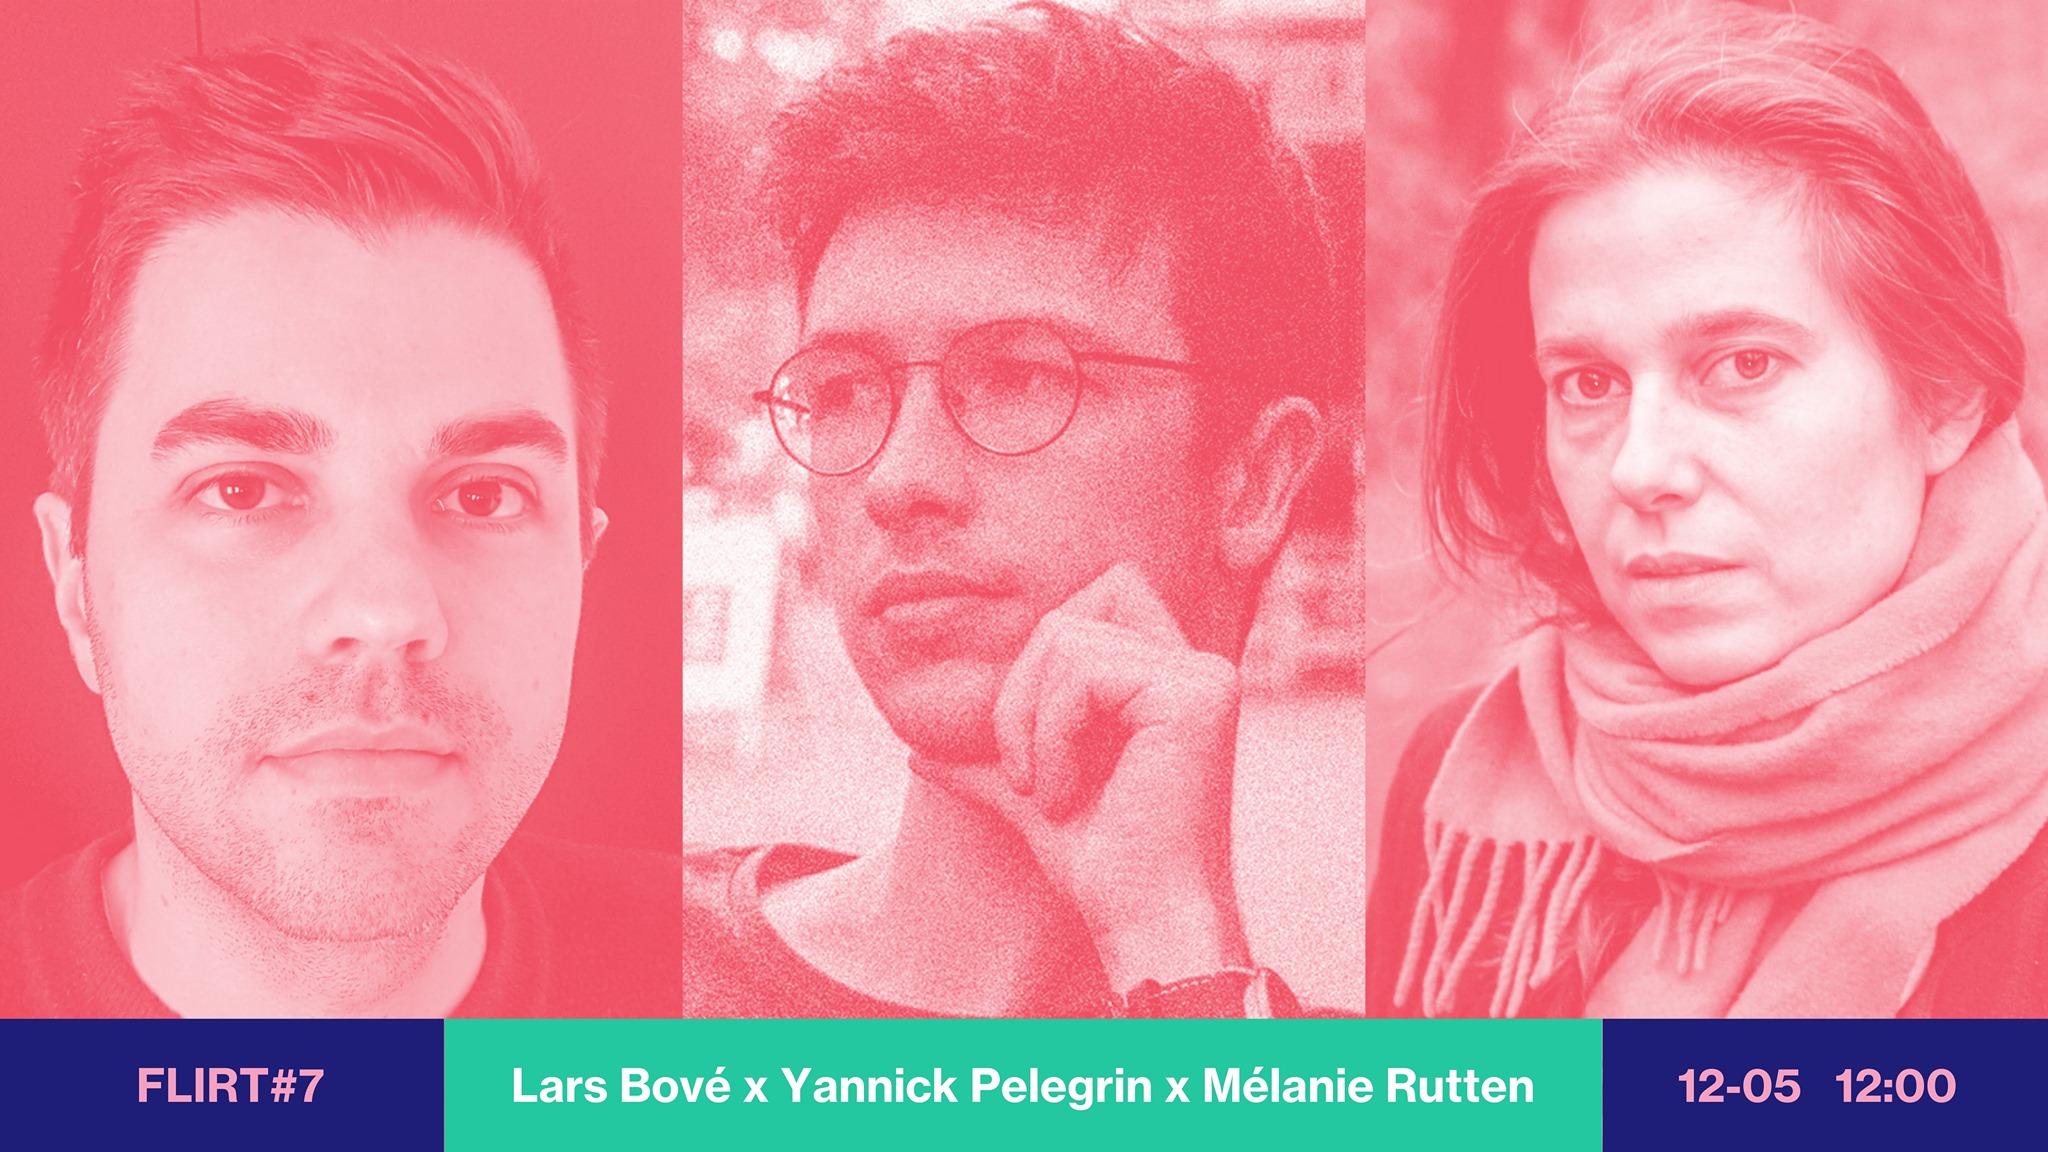 FLIRT #7 Lars Bové, Yannick Pelegrin & Mélanie Rutten